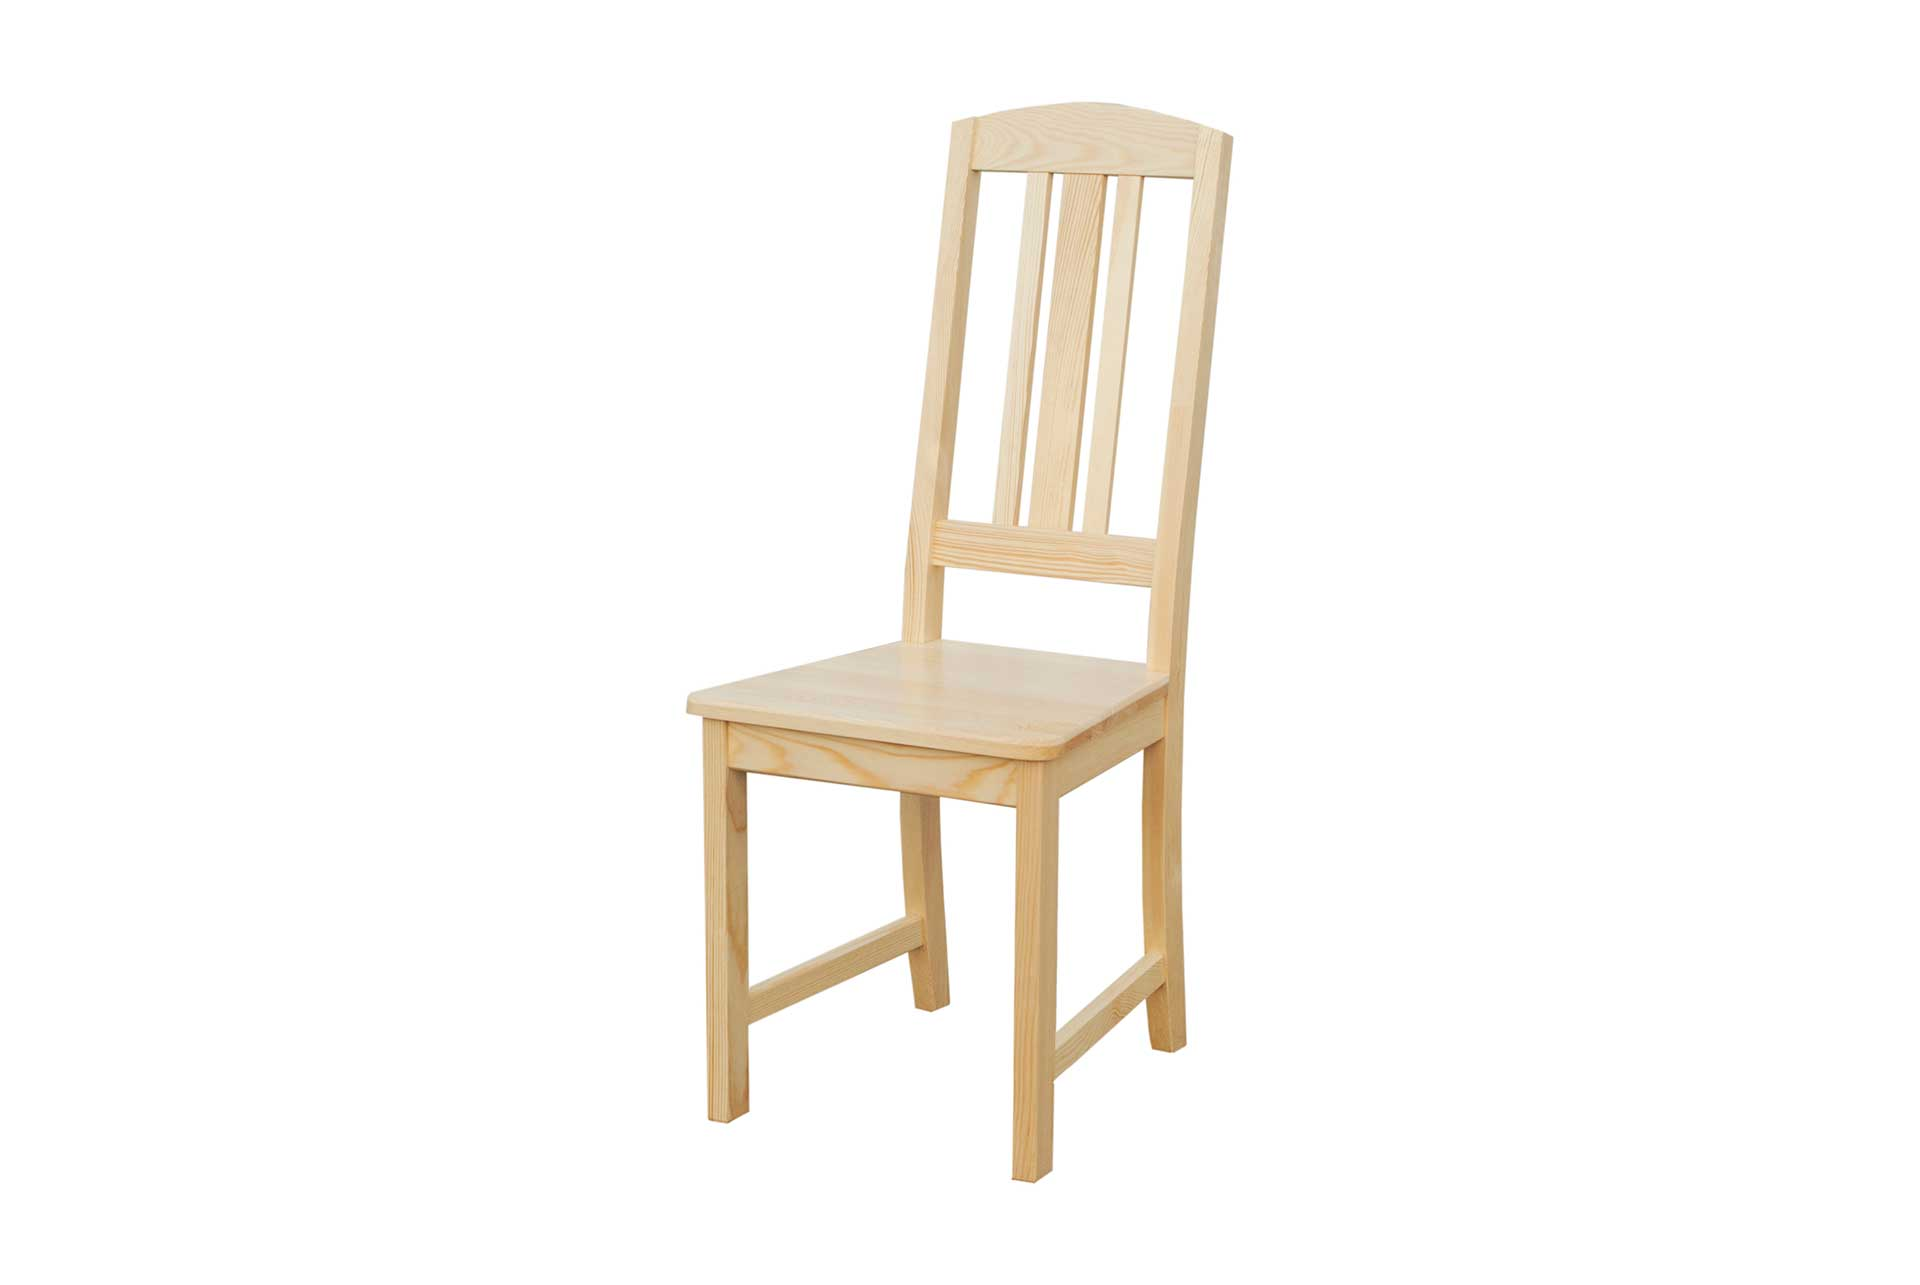 200 Krzesło KS7 KS-7 ks 7